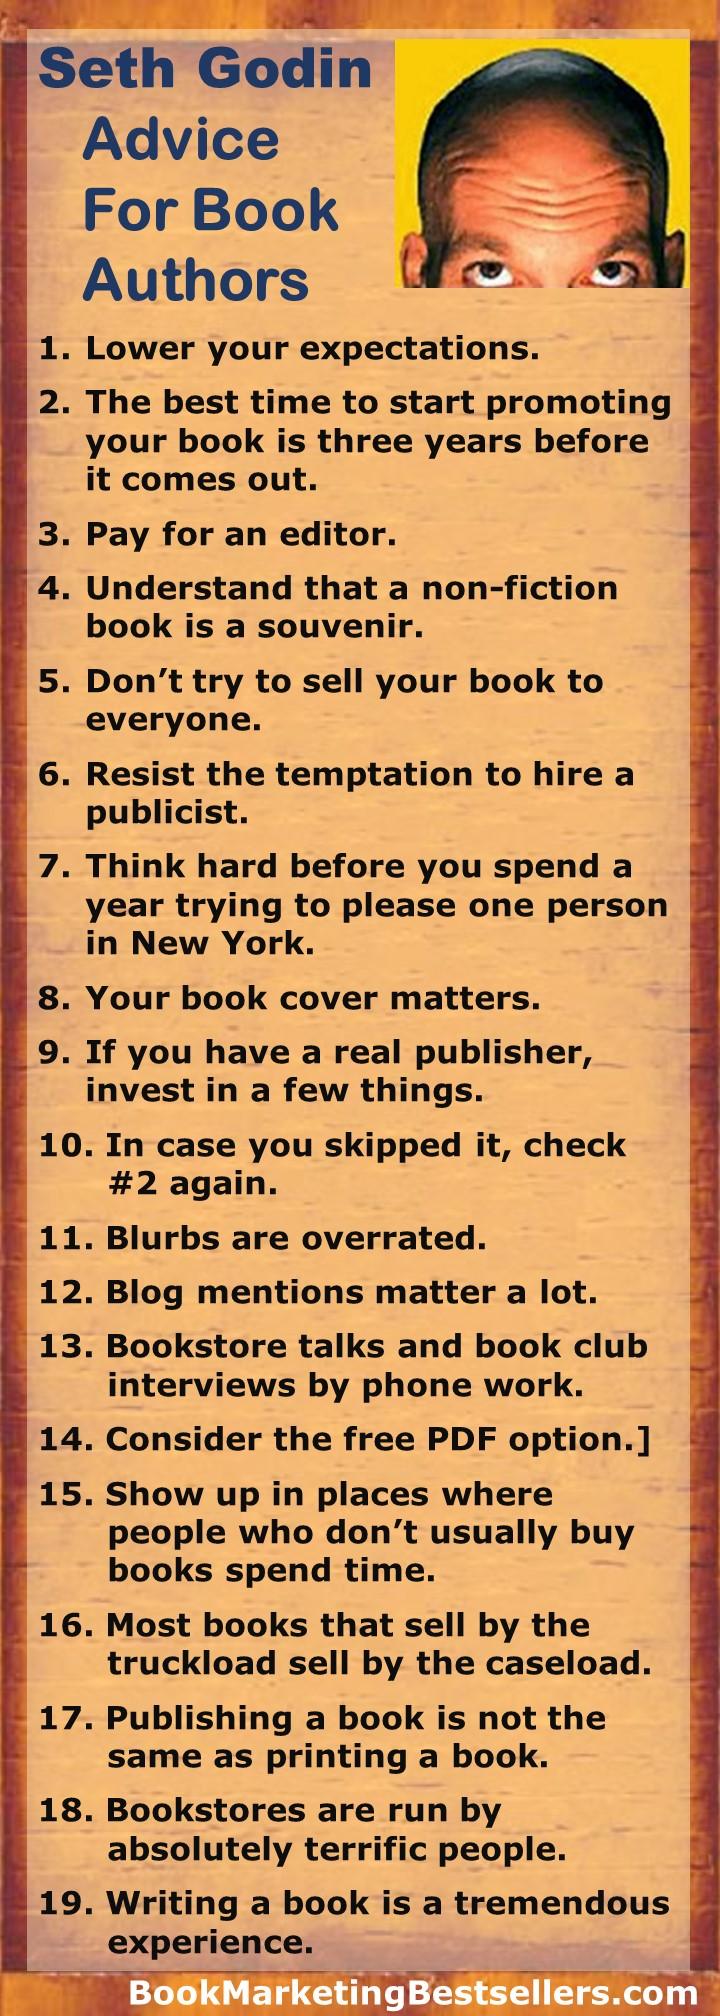 Seth Godin: Advice for Book Authors